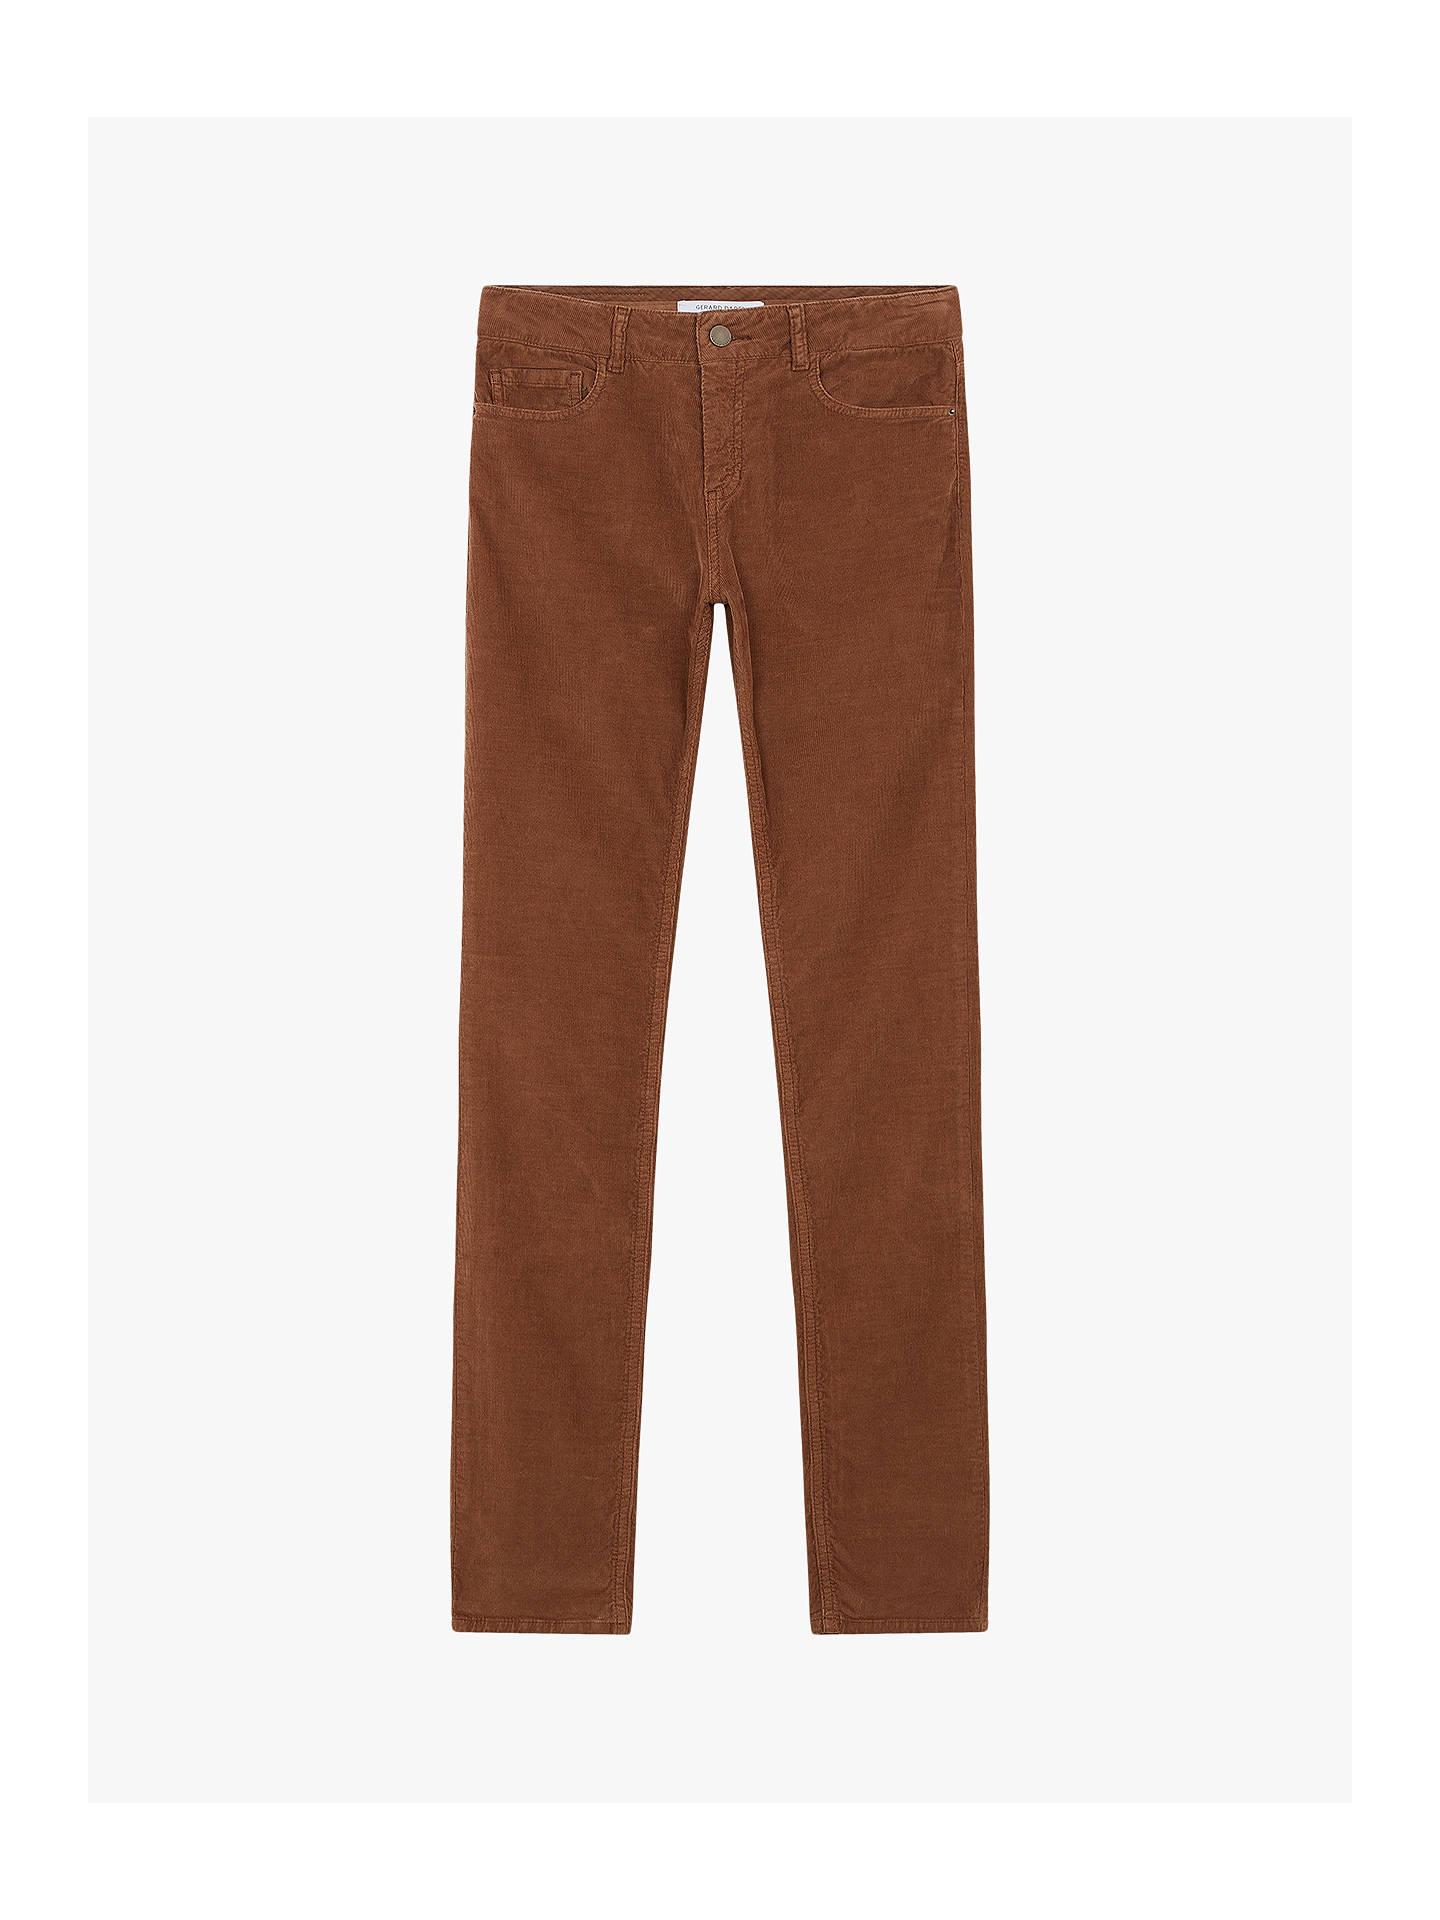 a6f05df8192 Gerard Darel Gaston Skinny Fit Jeans at John Lewis   Partners